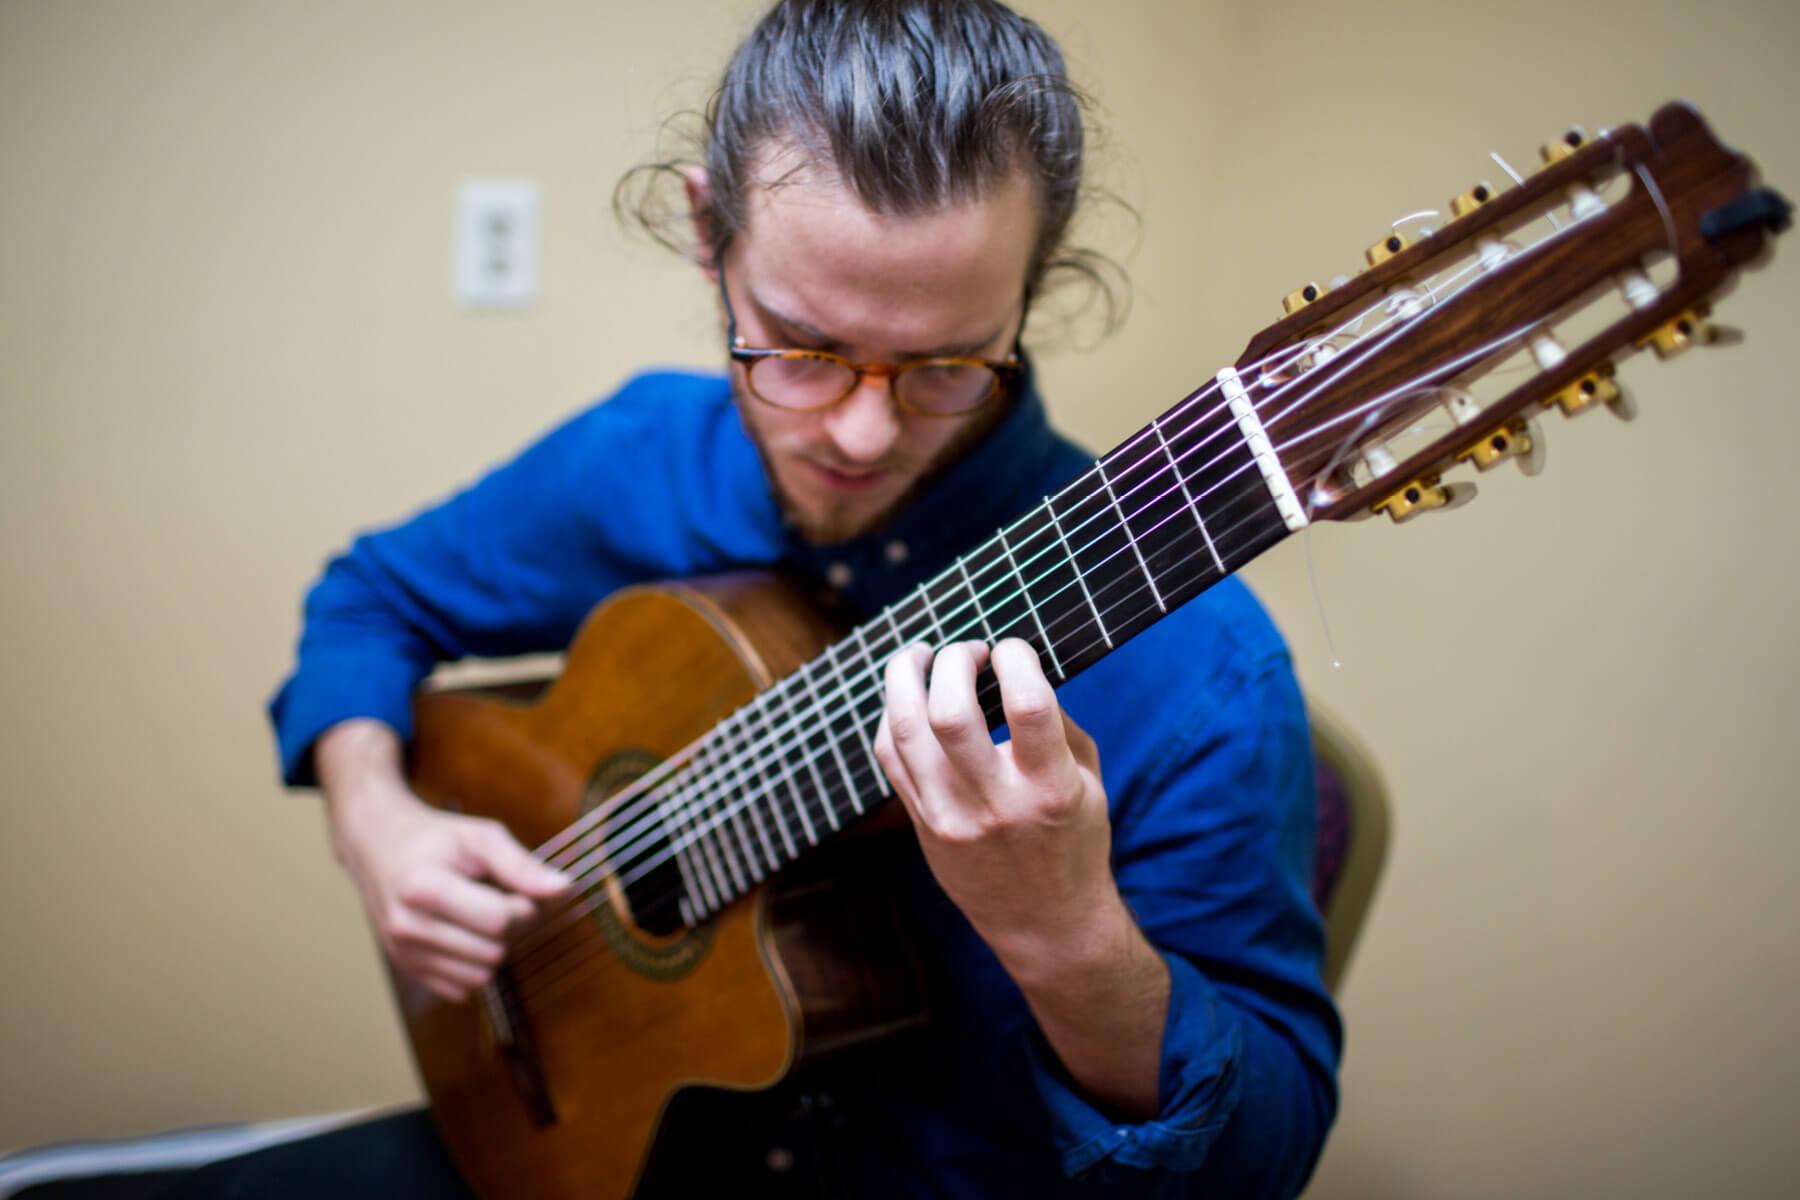 Man plays acoustic guitar, close up.